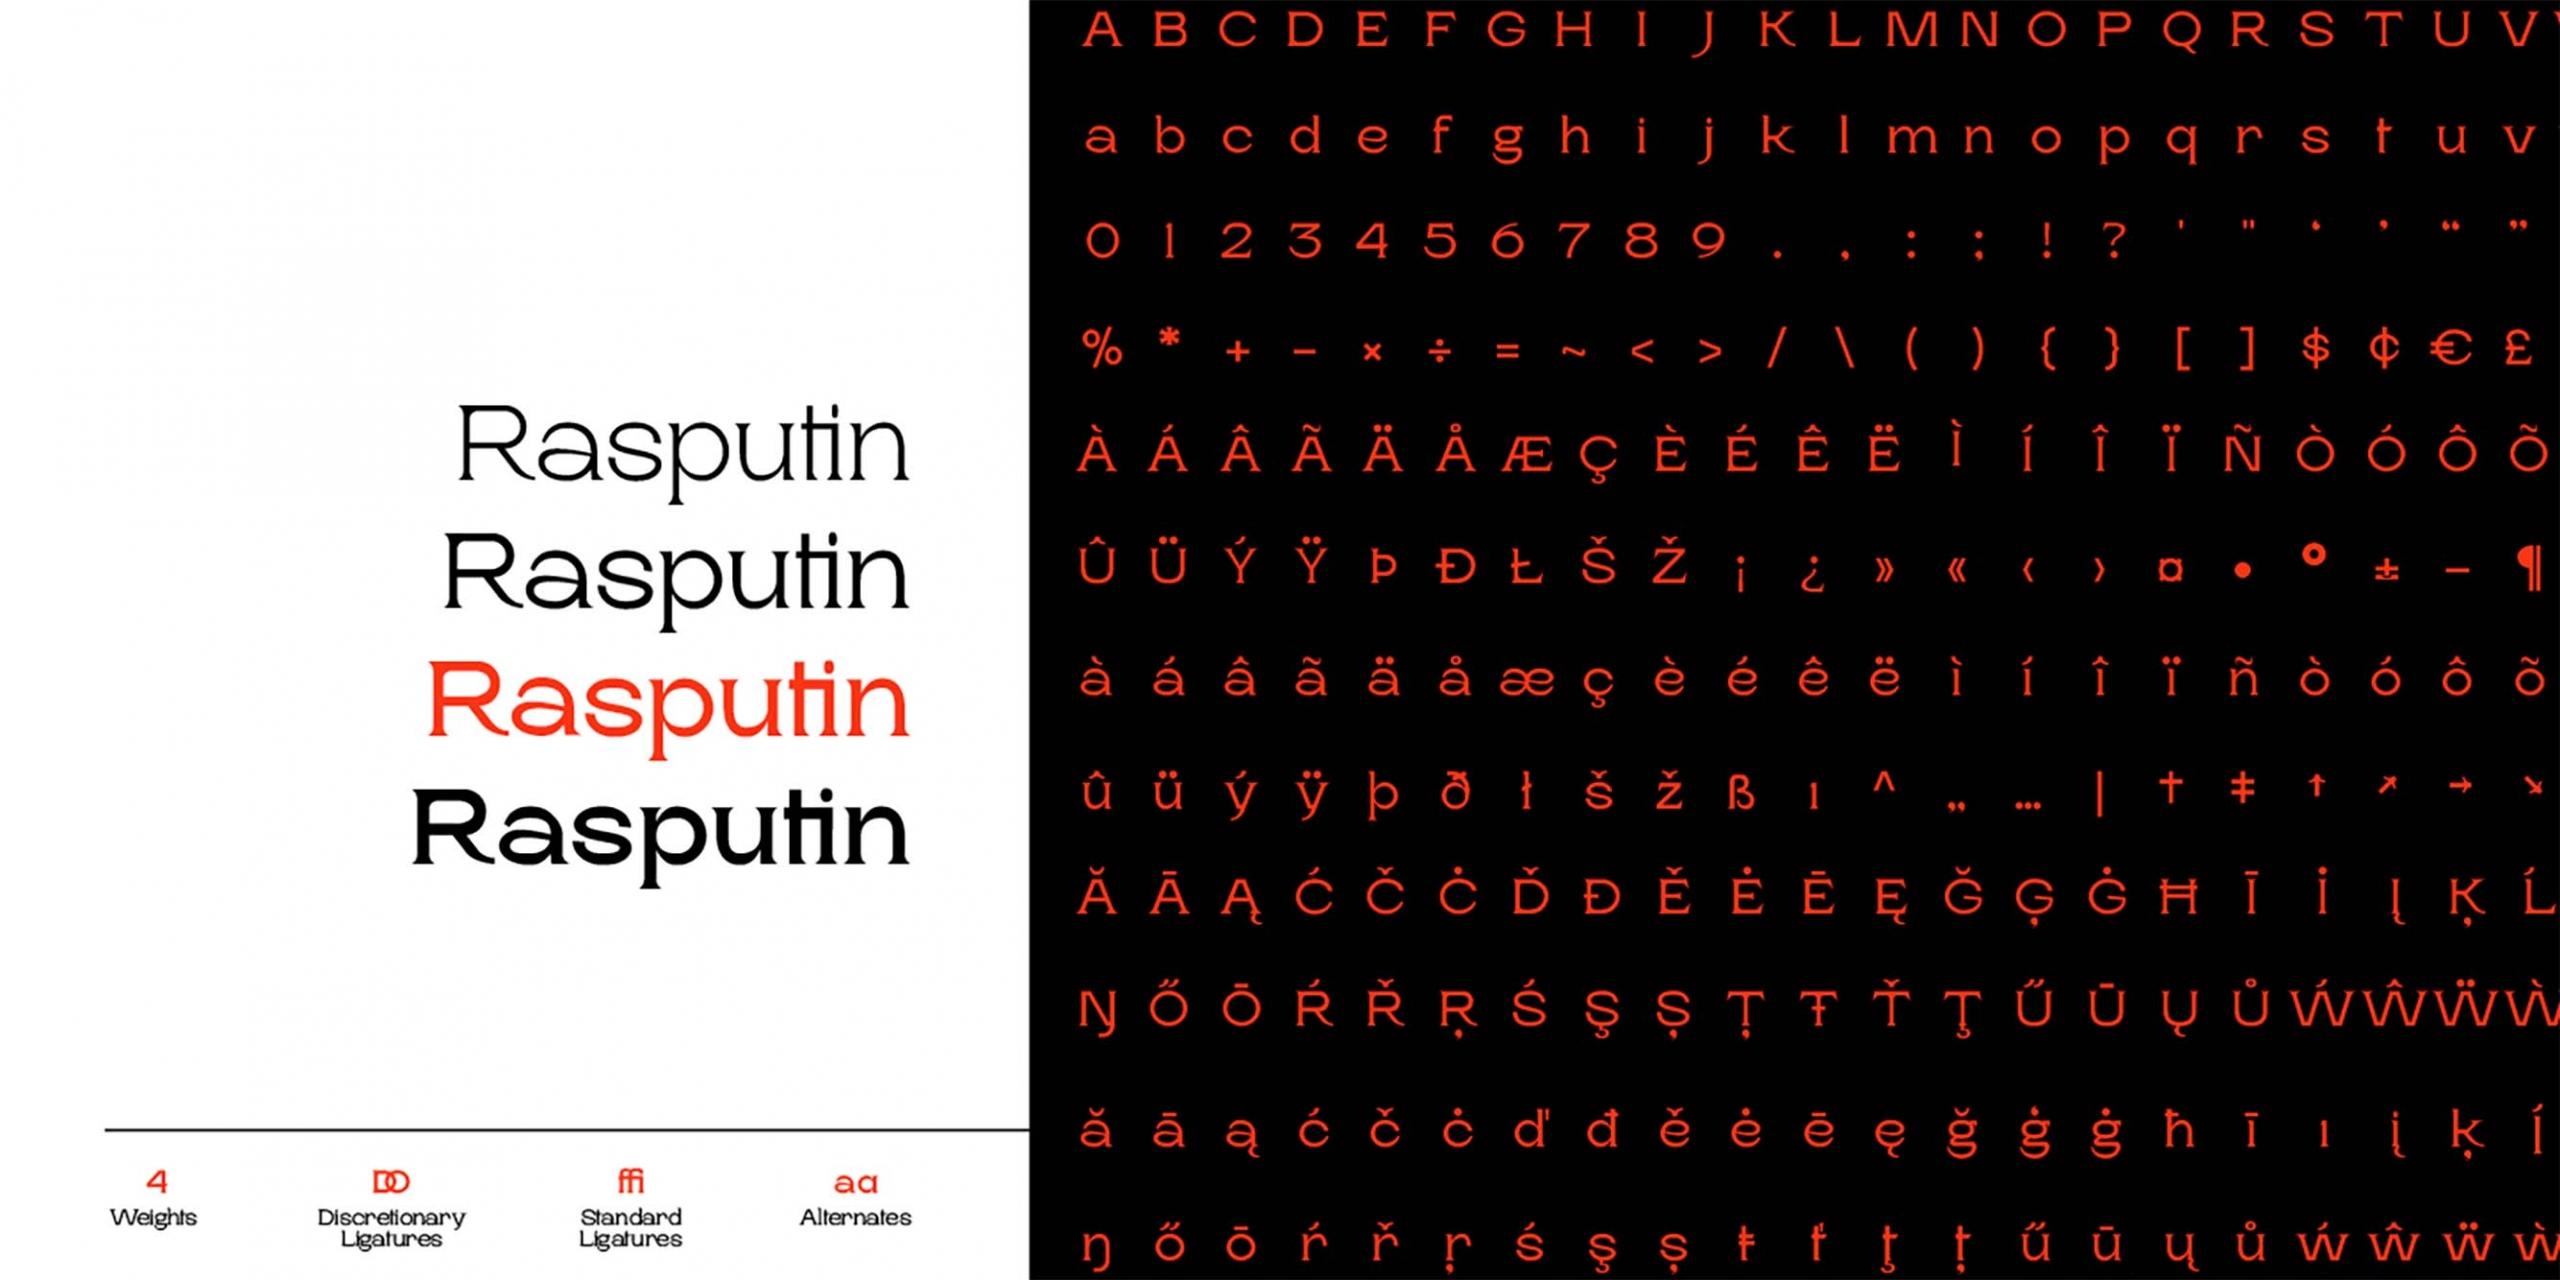 Rasputin Serif Font 6